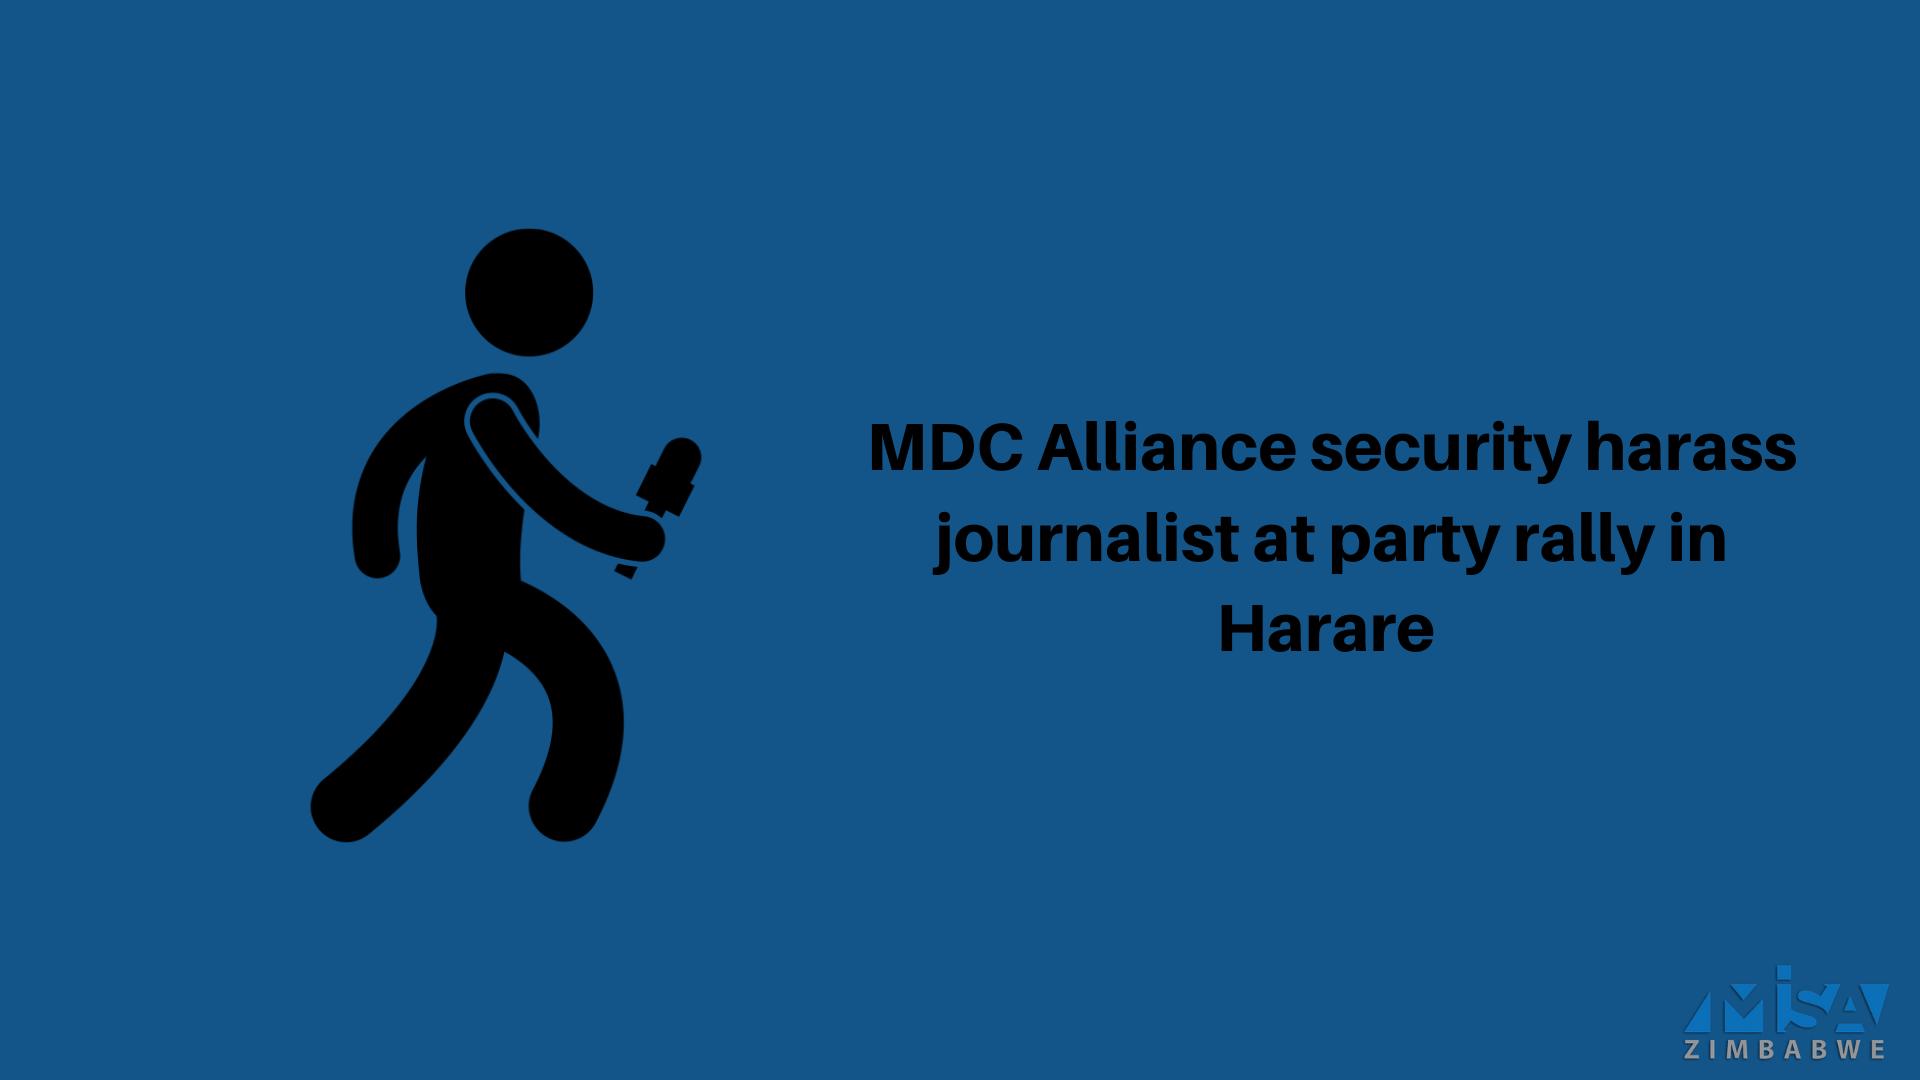 MISA Zimbabwe condemns harassment of journalist